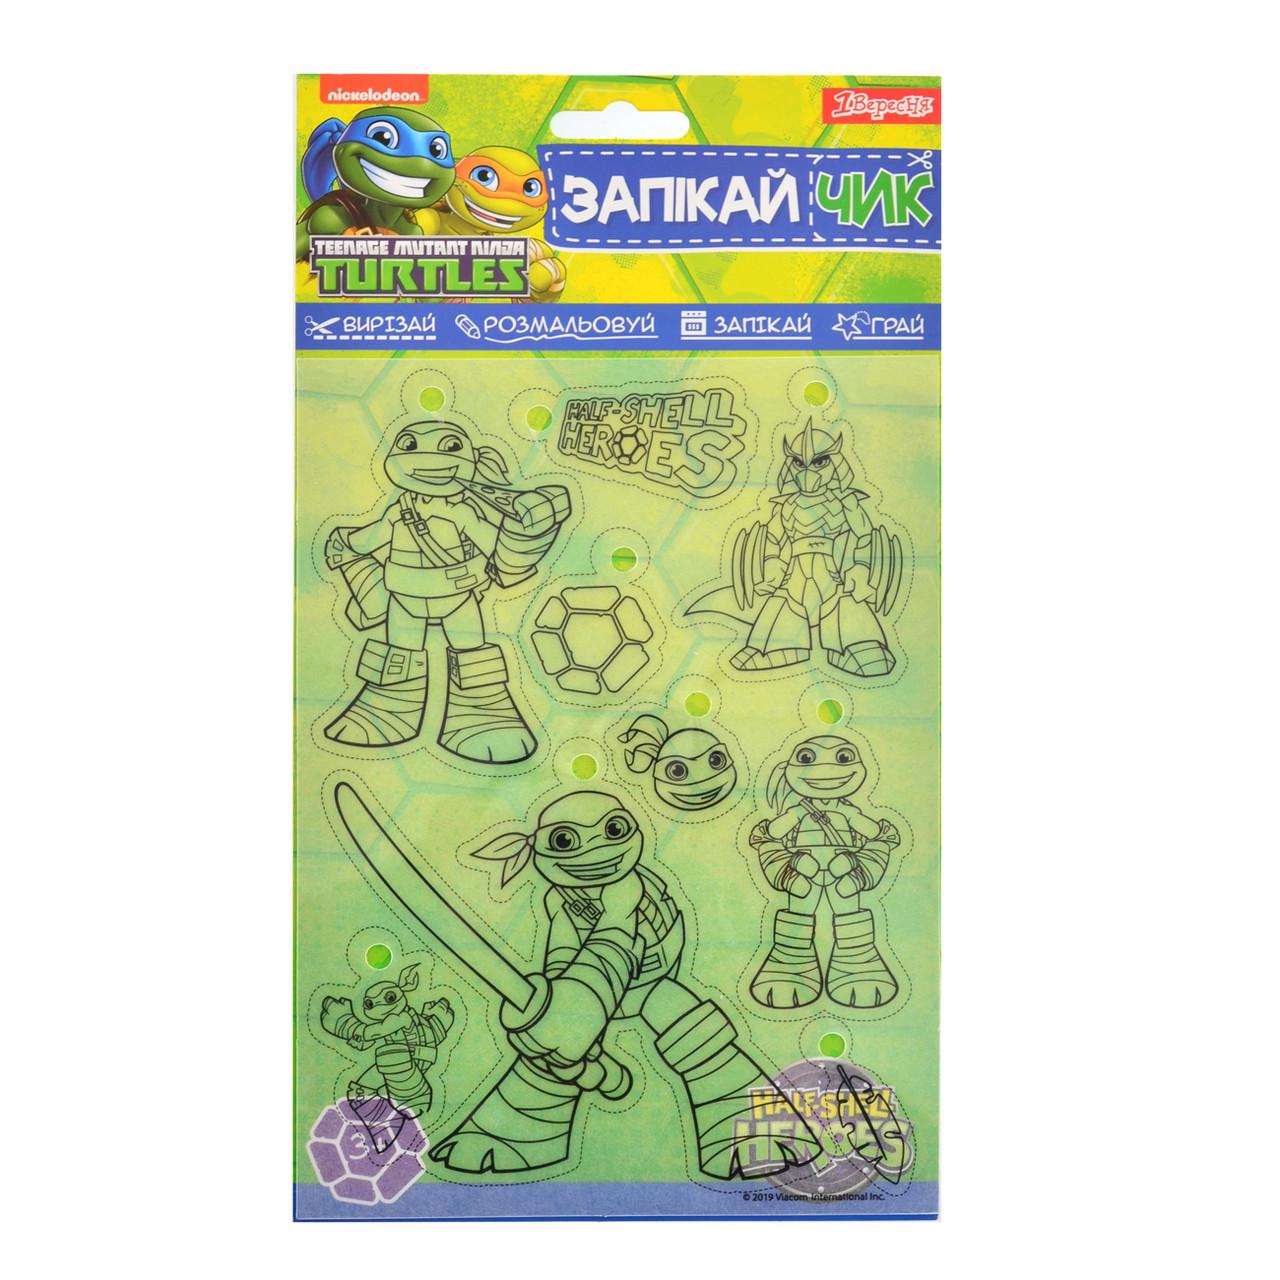 Набор для детского творчестваЗапекайчик, TMNT код: 953729